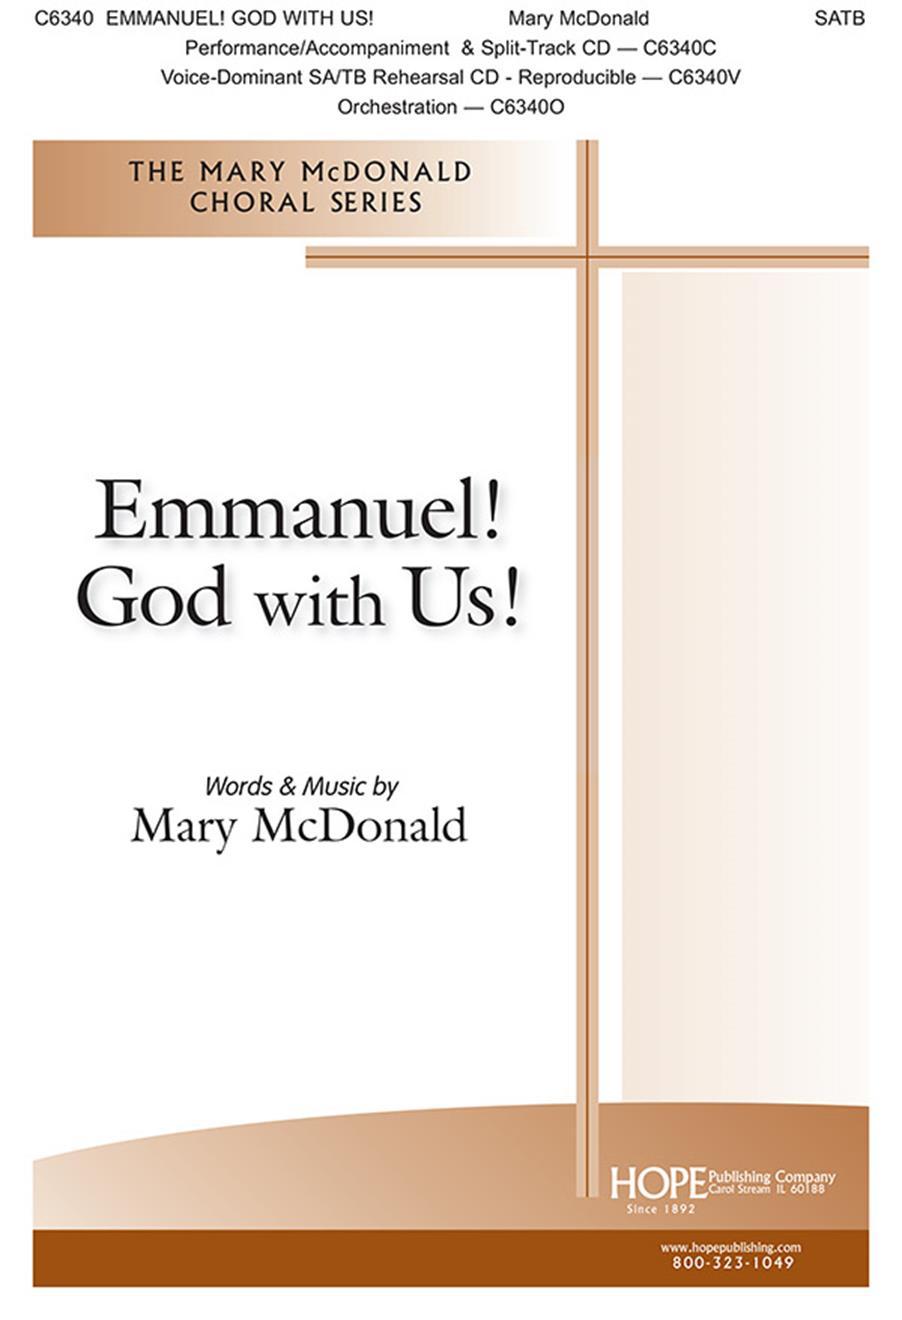 Emmanuel God with Us - SATB Cover Image